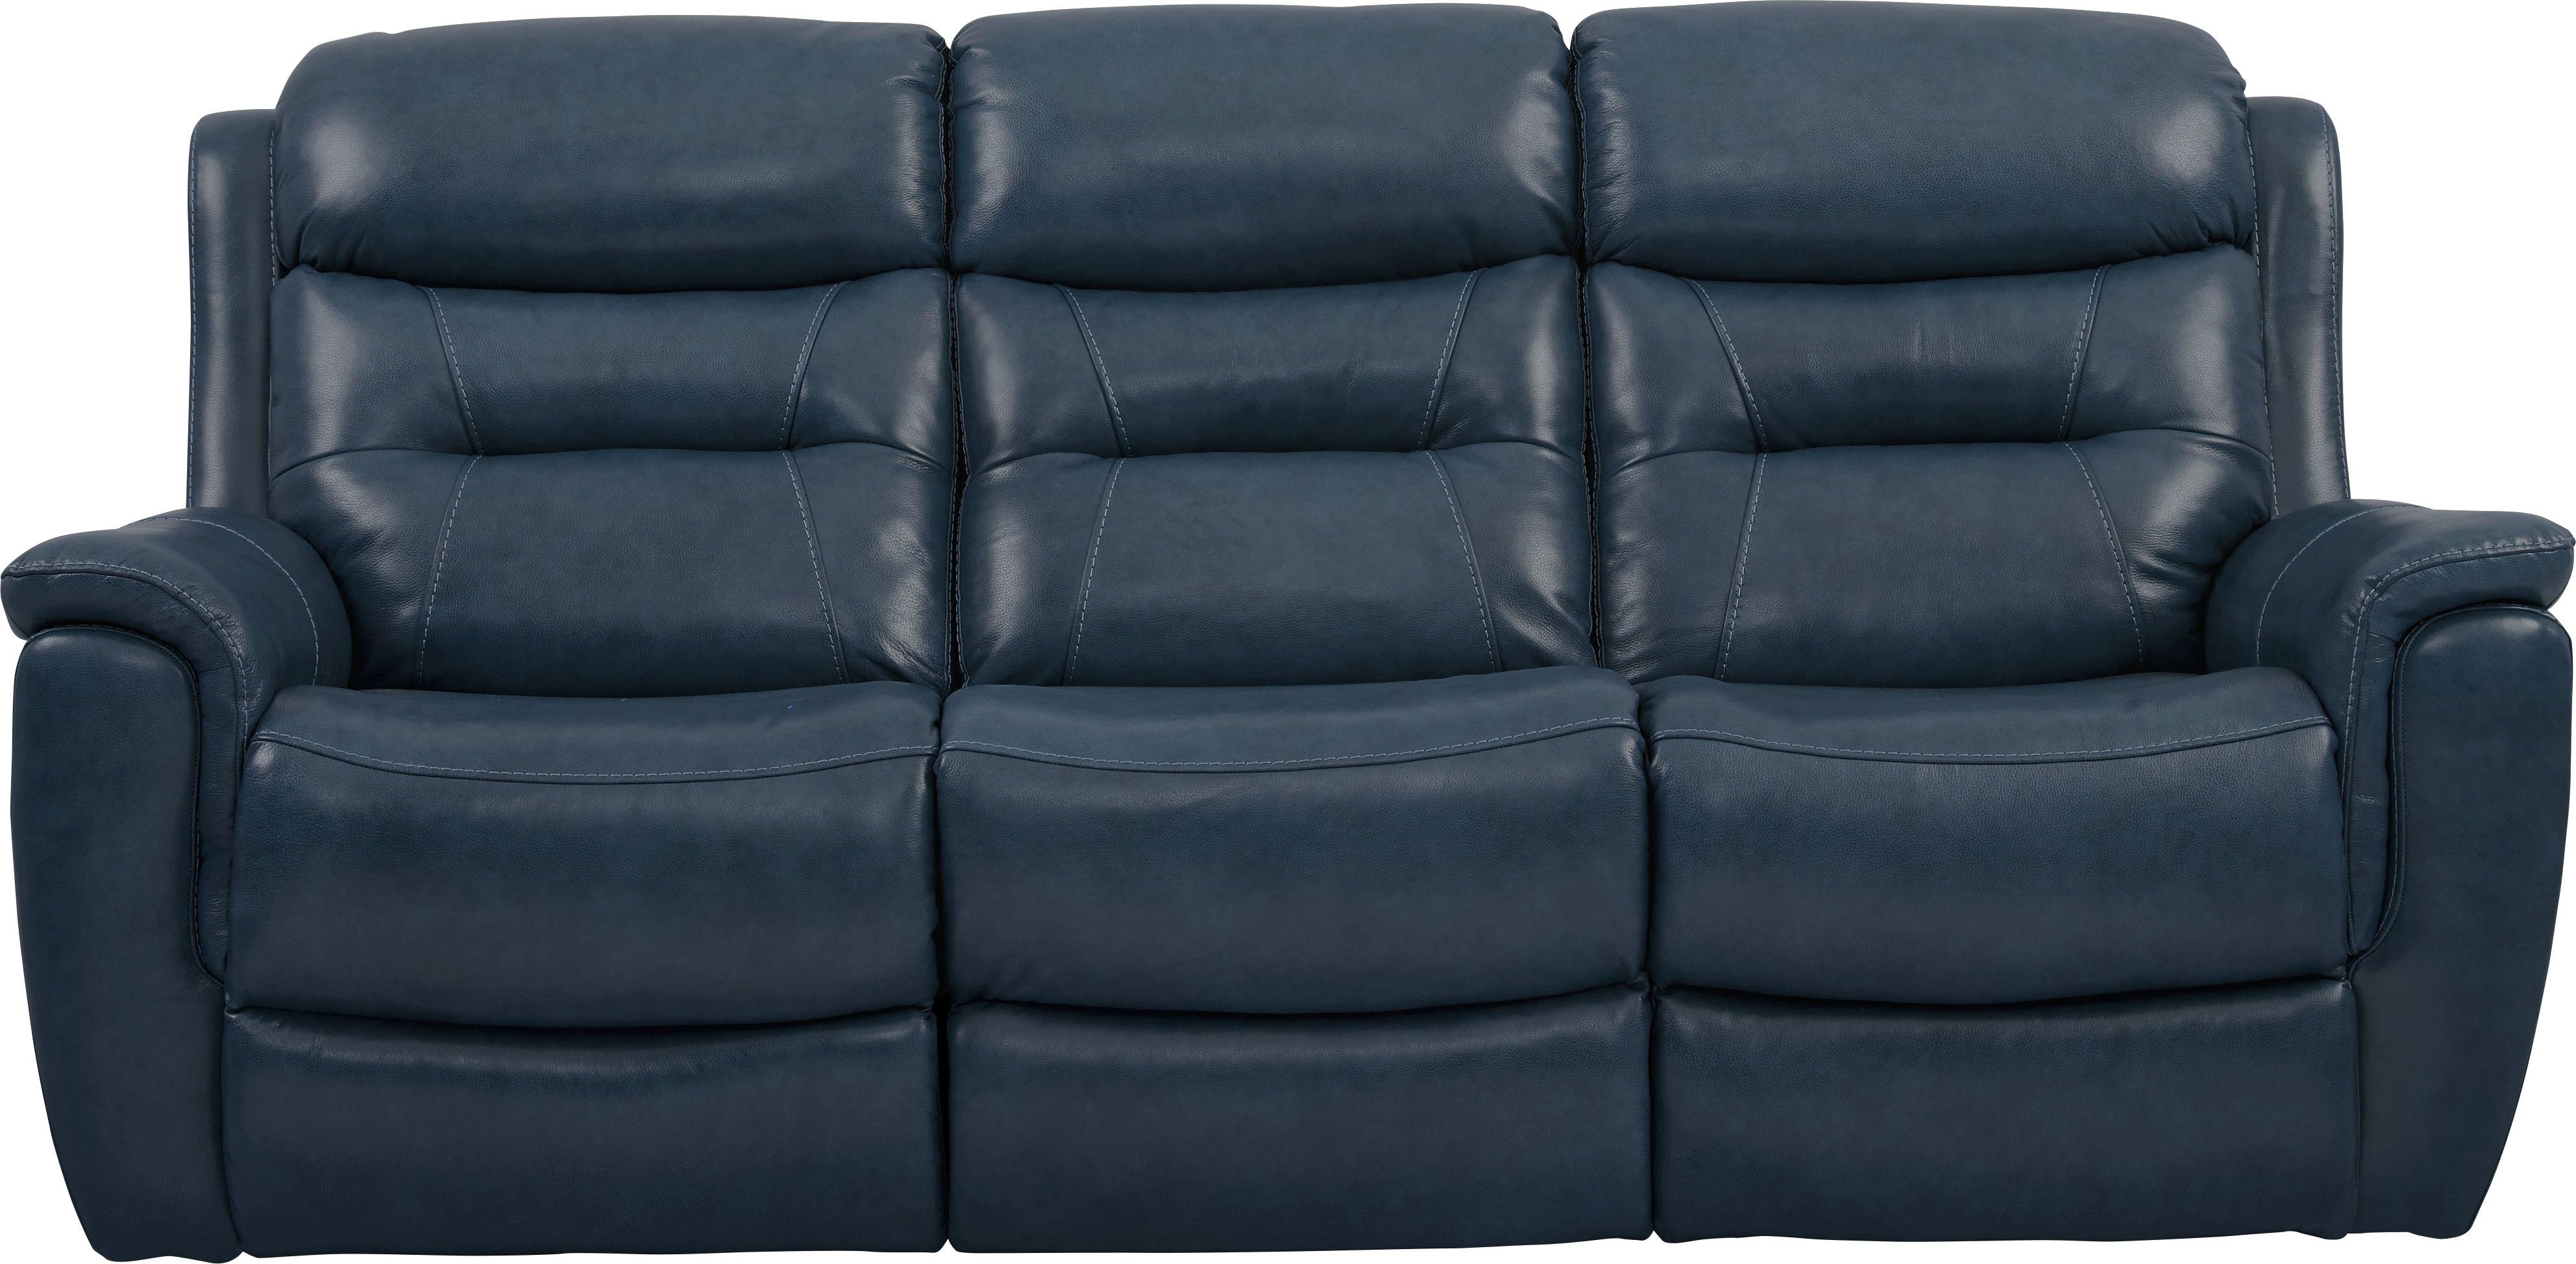 Sabella Navy Leather Reclining Sofa Reclining Sofa Power